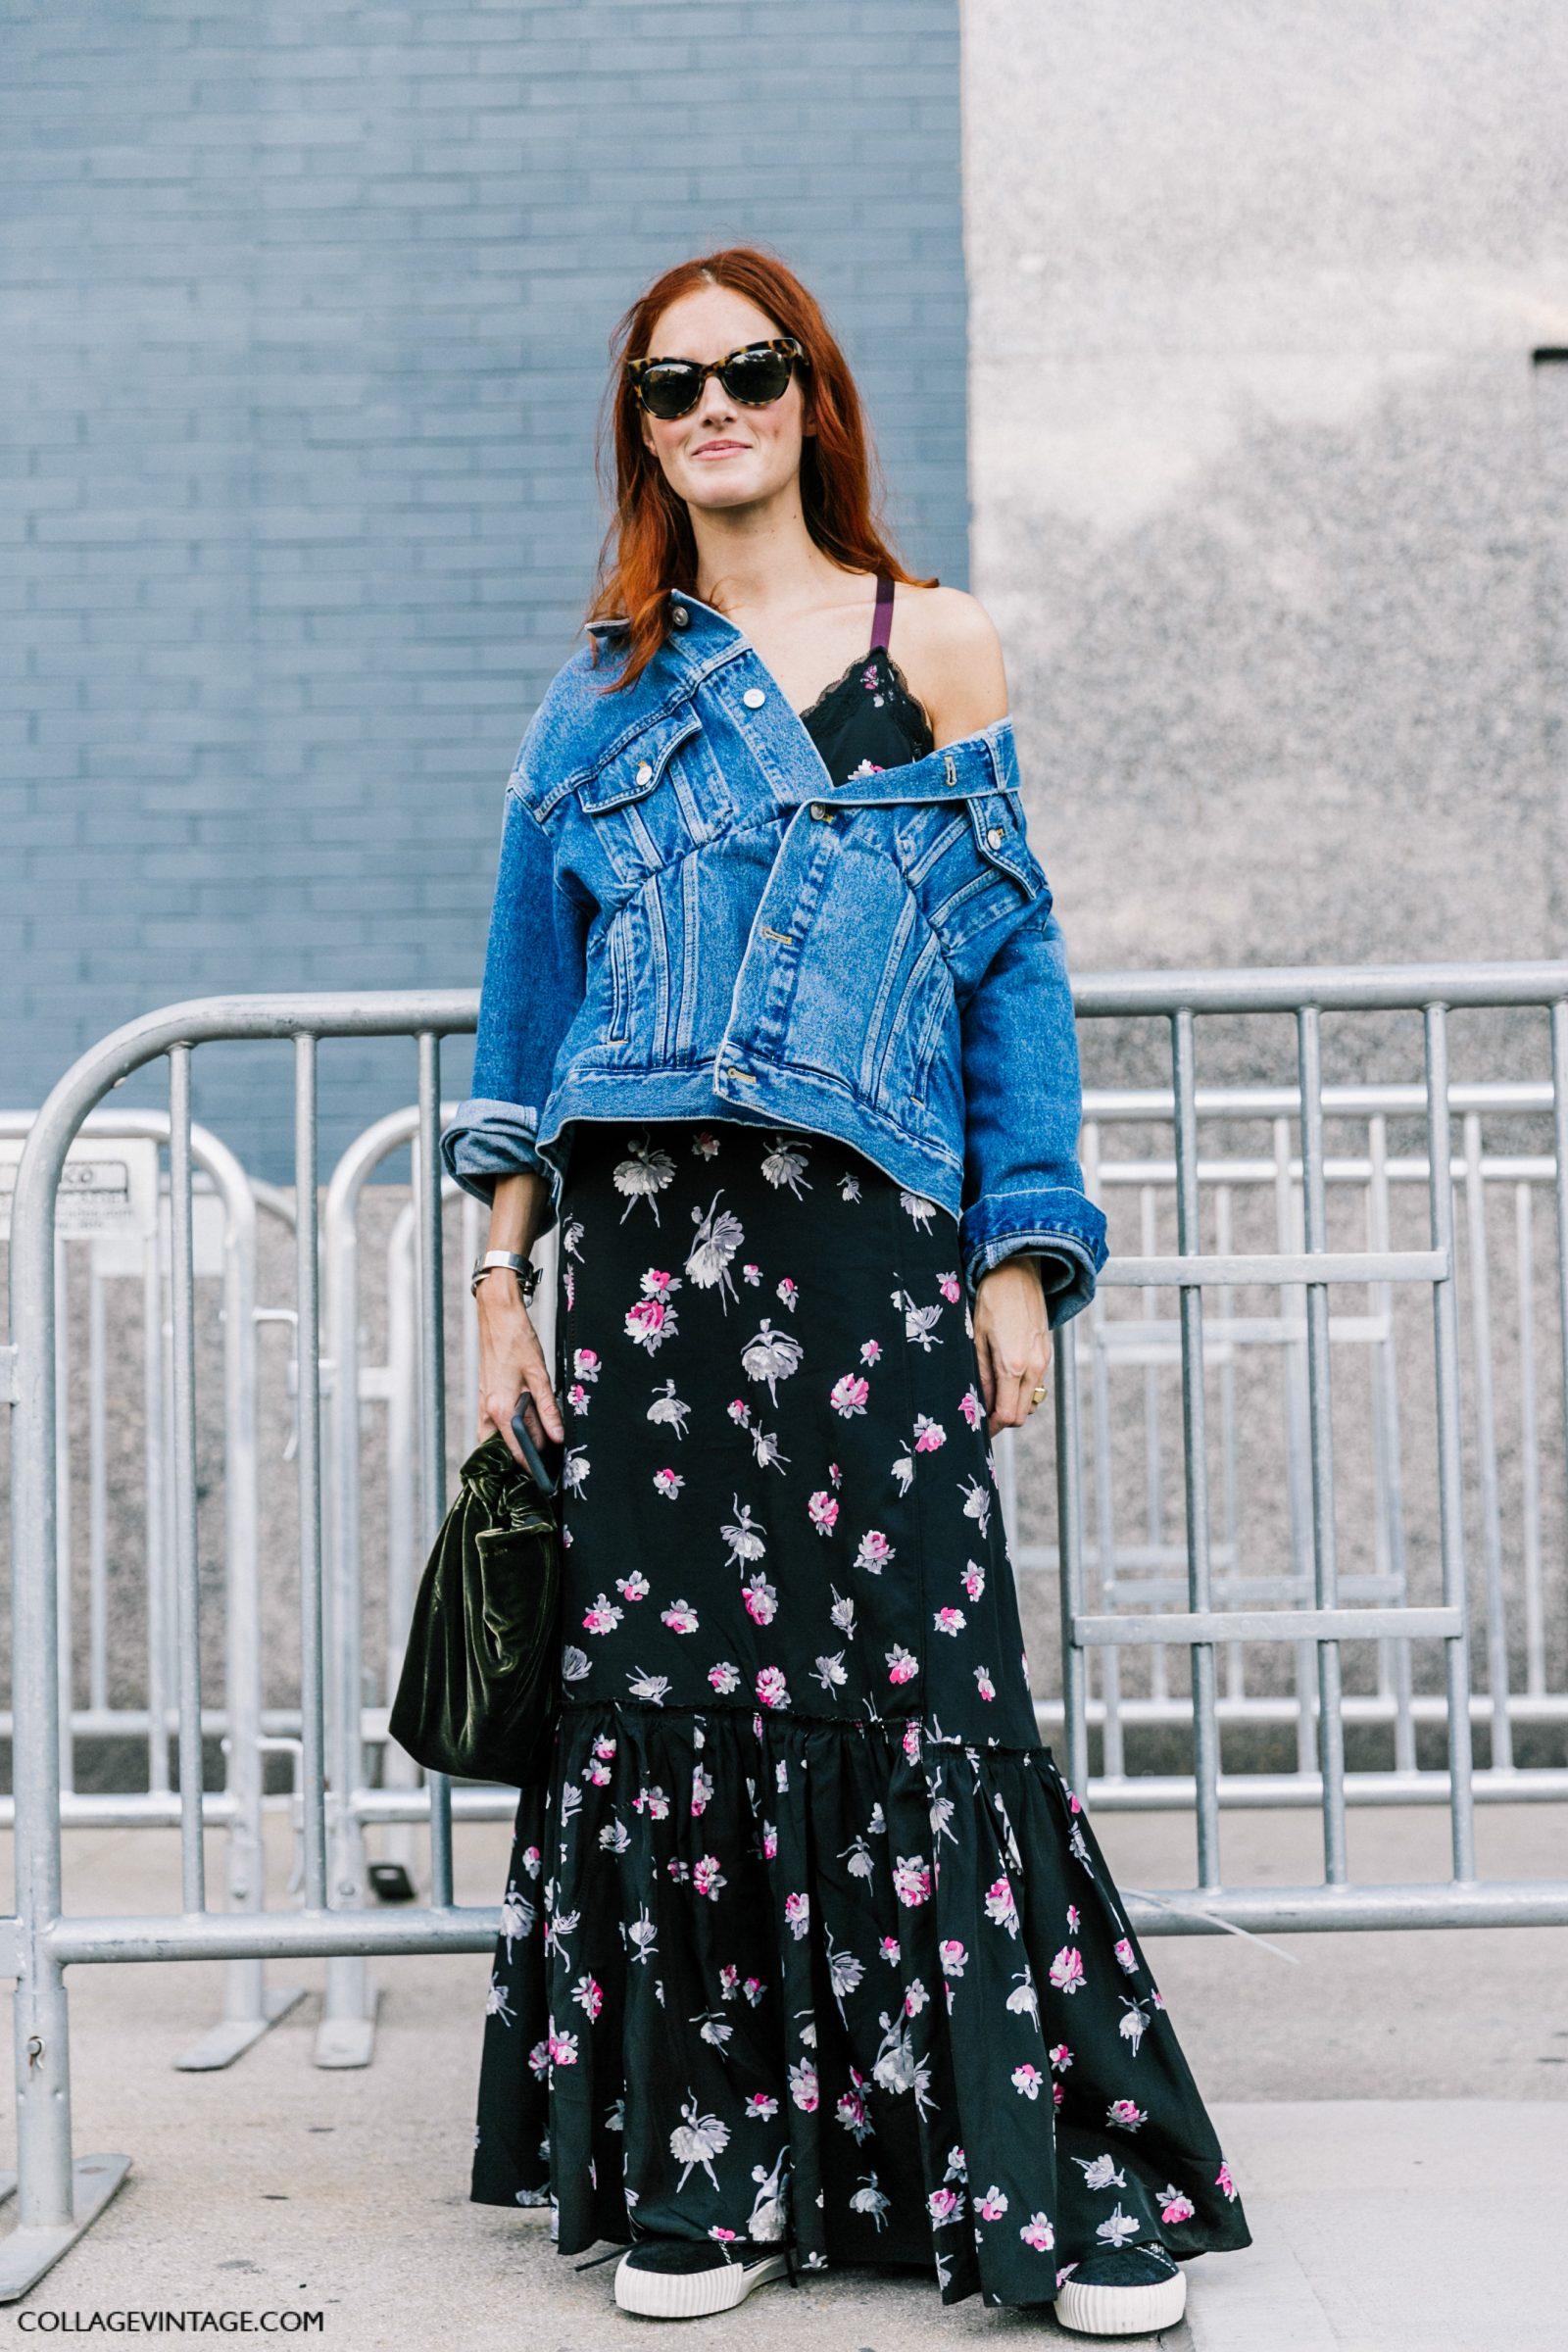 nyfw-new_york_fashion_week_ss17-street_style-outfits-collage_vintage-vintage-atuzarra-100